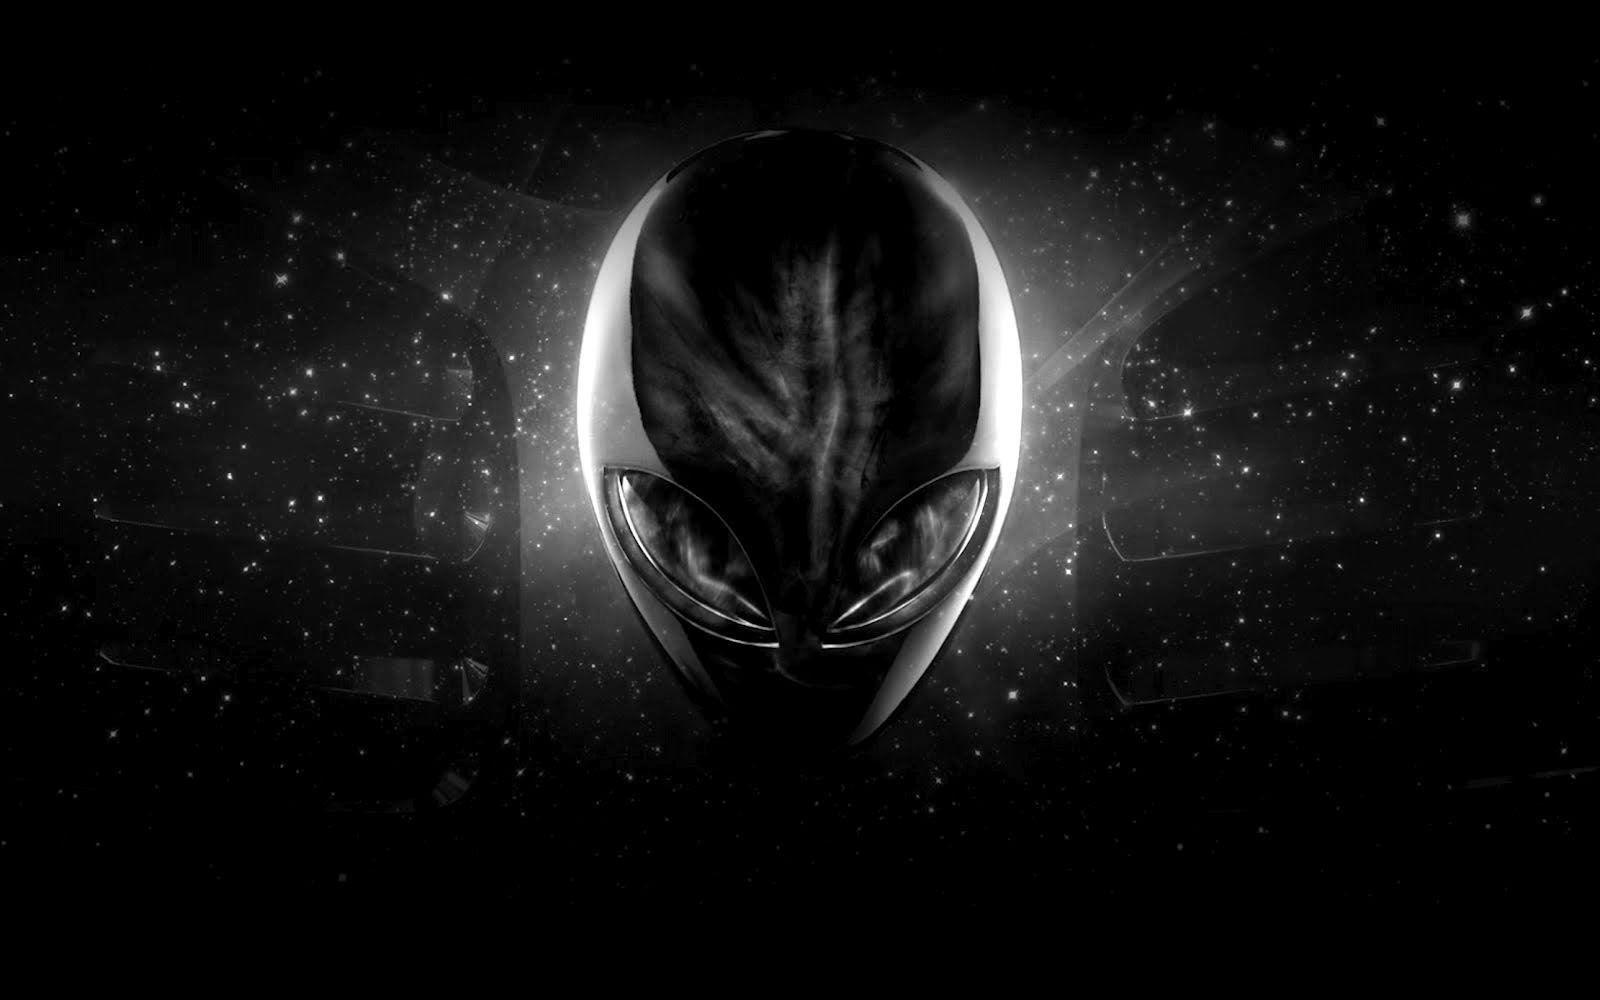 alienware wallpapers 284 29 jpg 1600 1000 alienware on wall papers id=26053